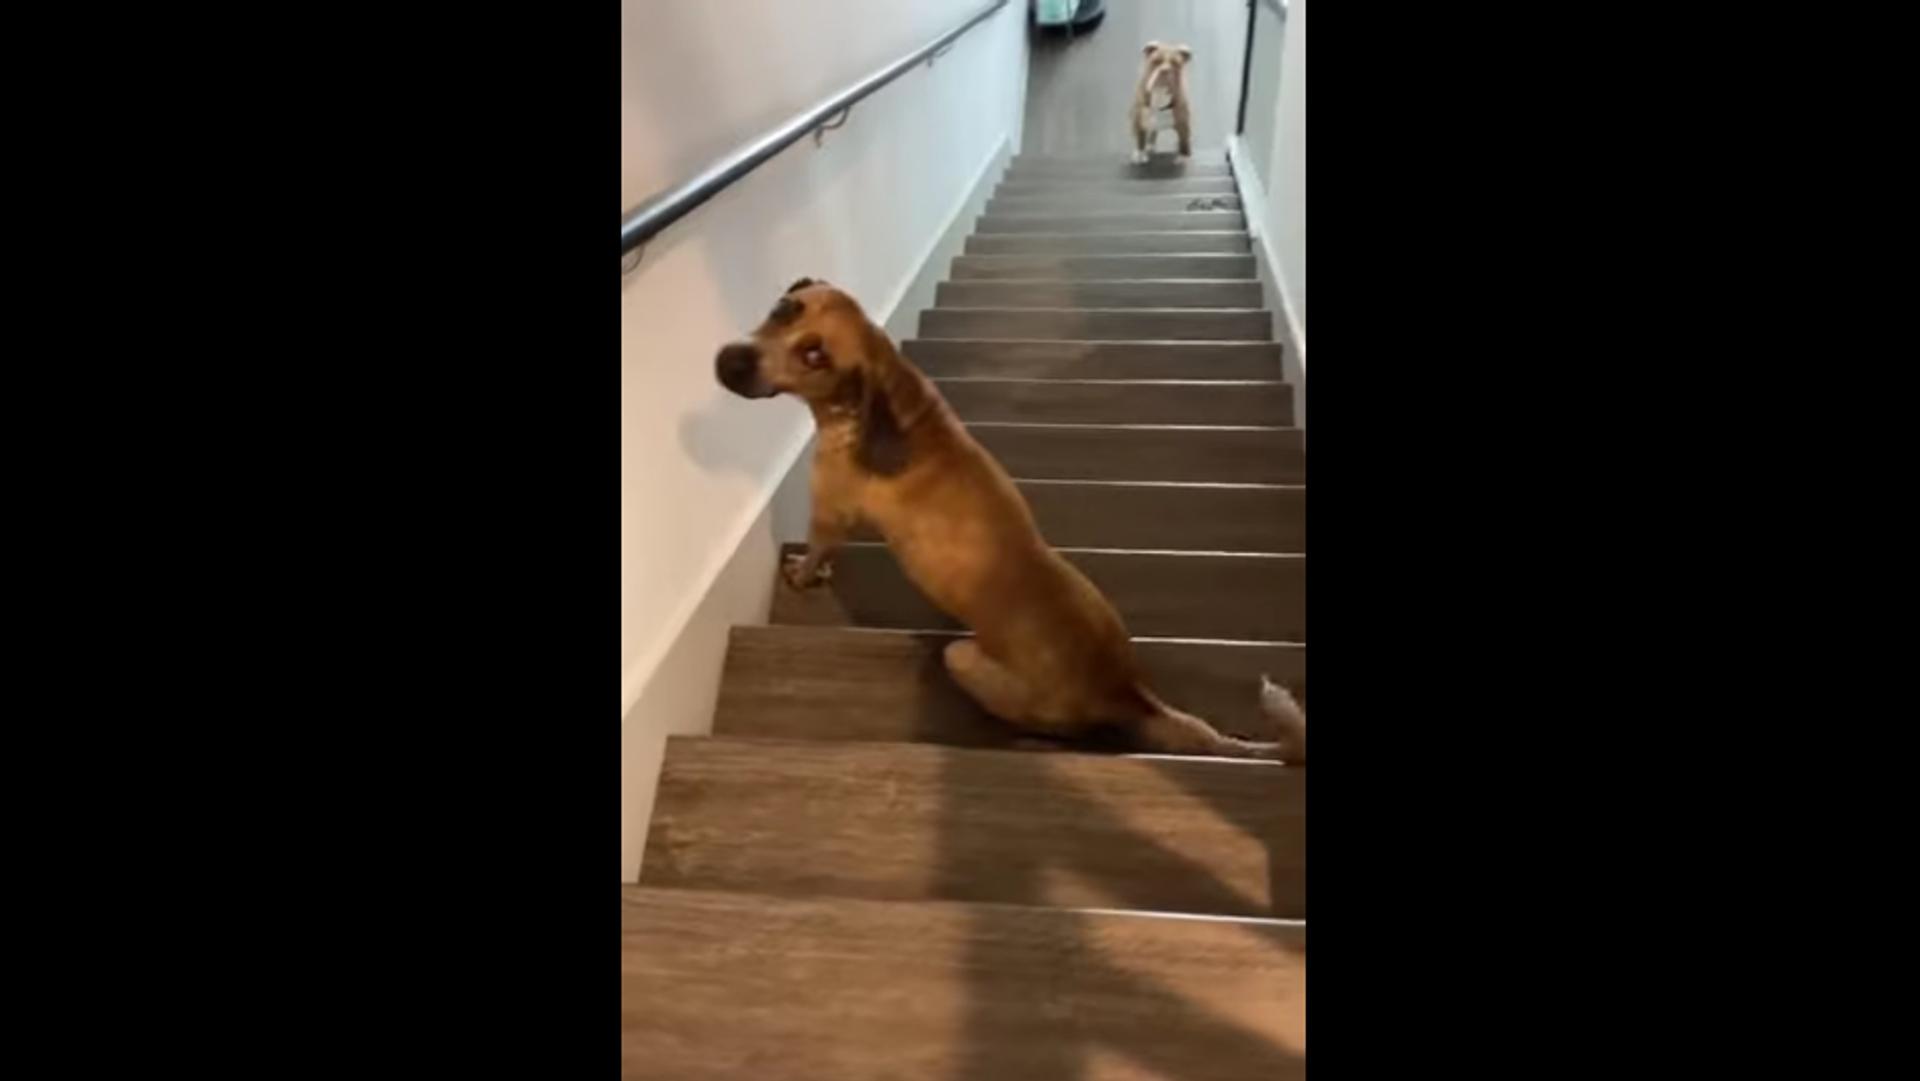 Dog on the stairs - Sputnik International, 1920, 24.09.2021